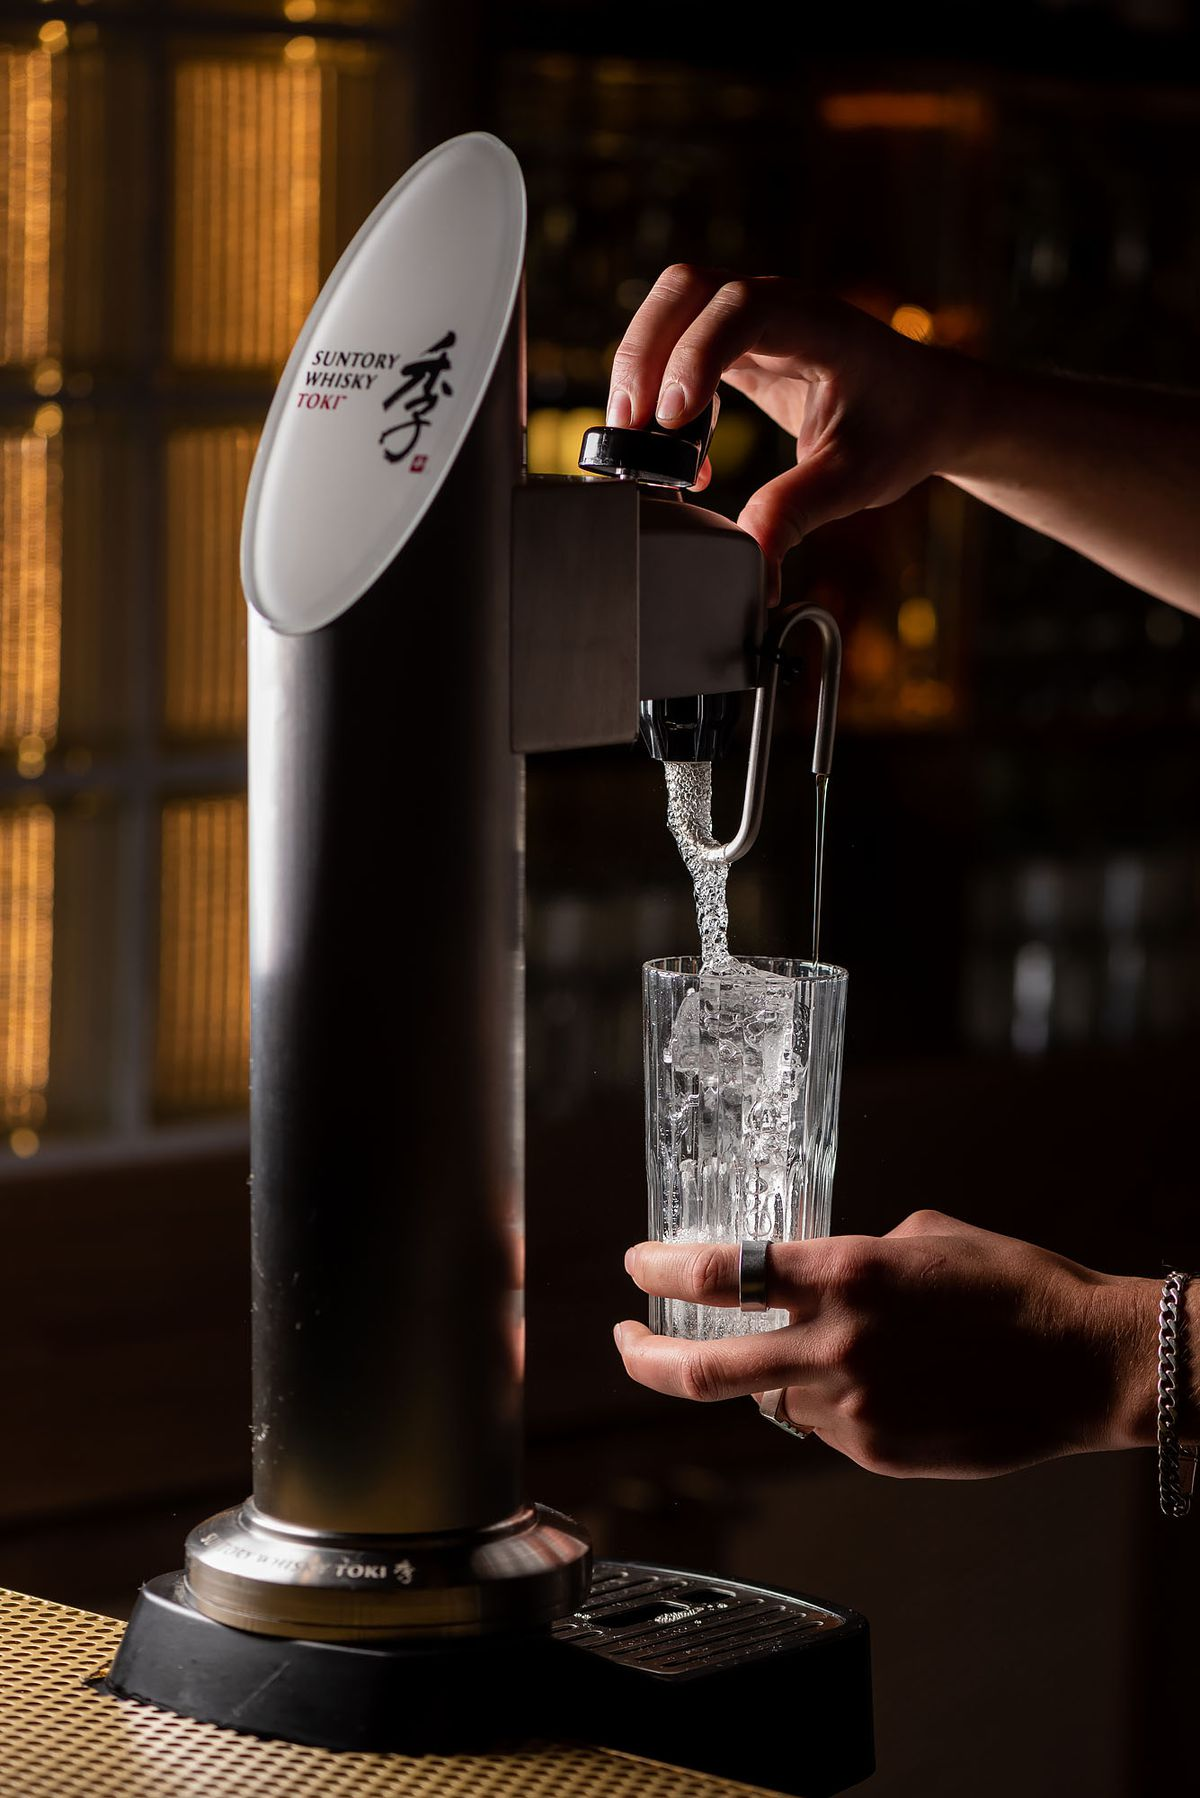 A Suntory toki highball machine pours alcohol.